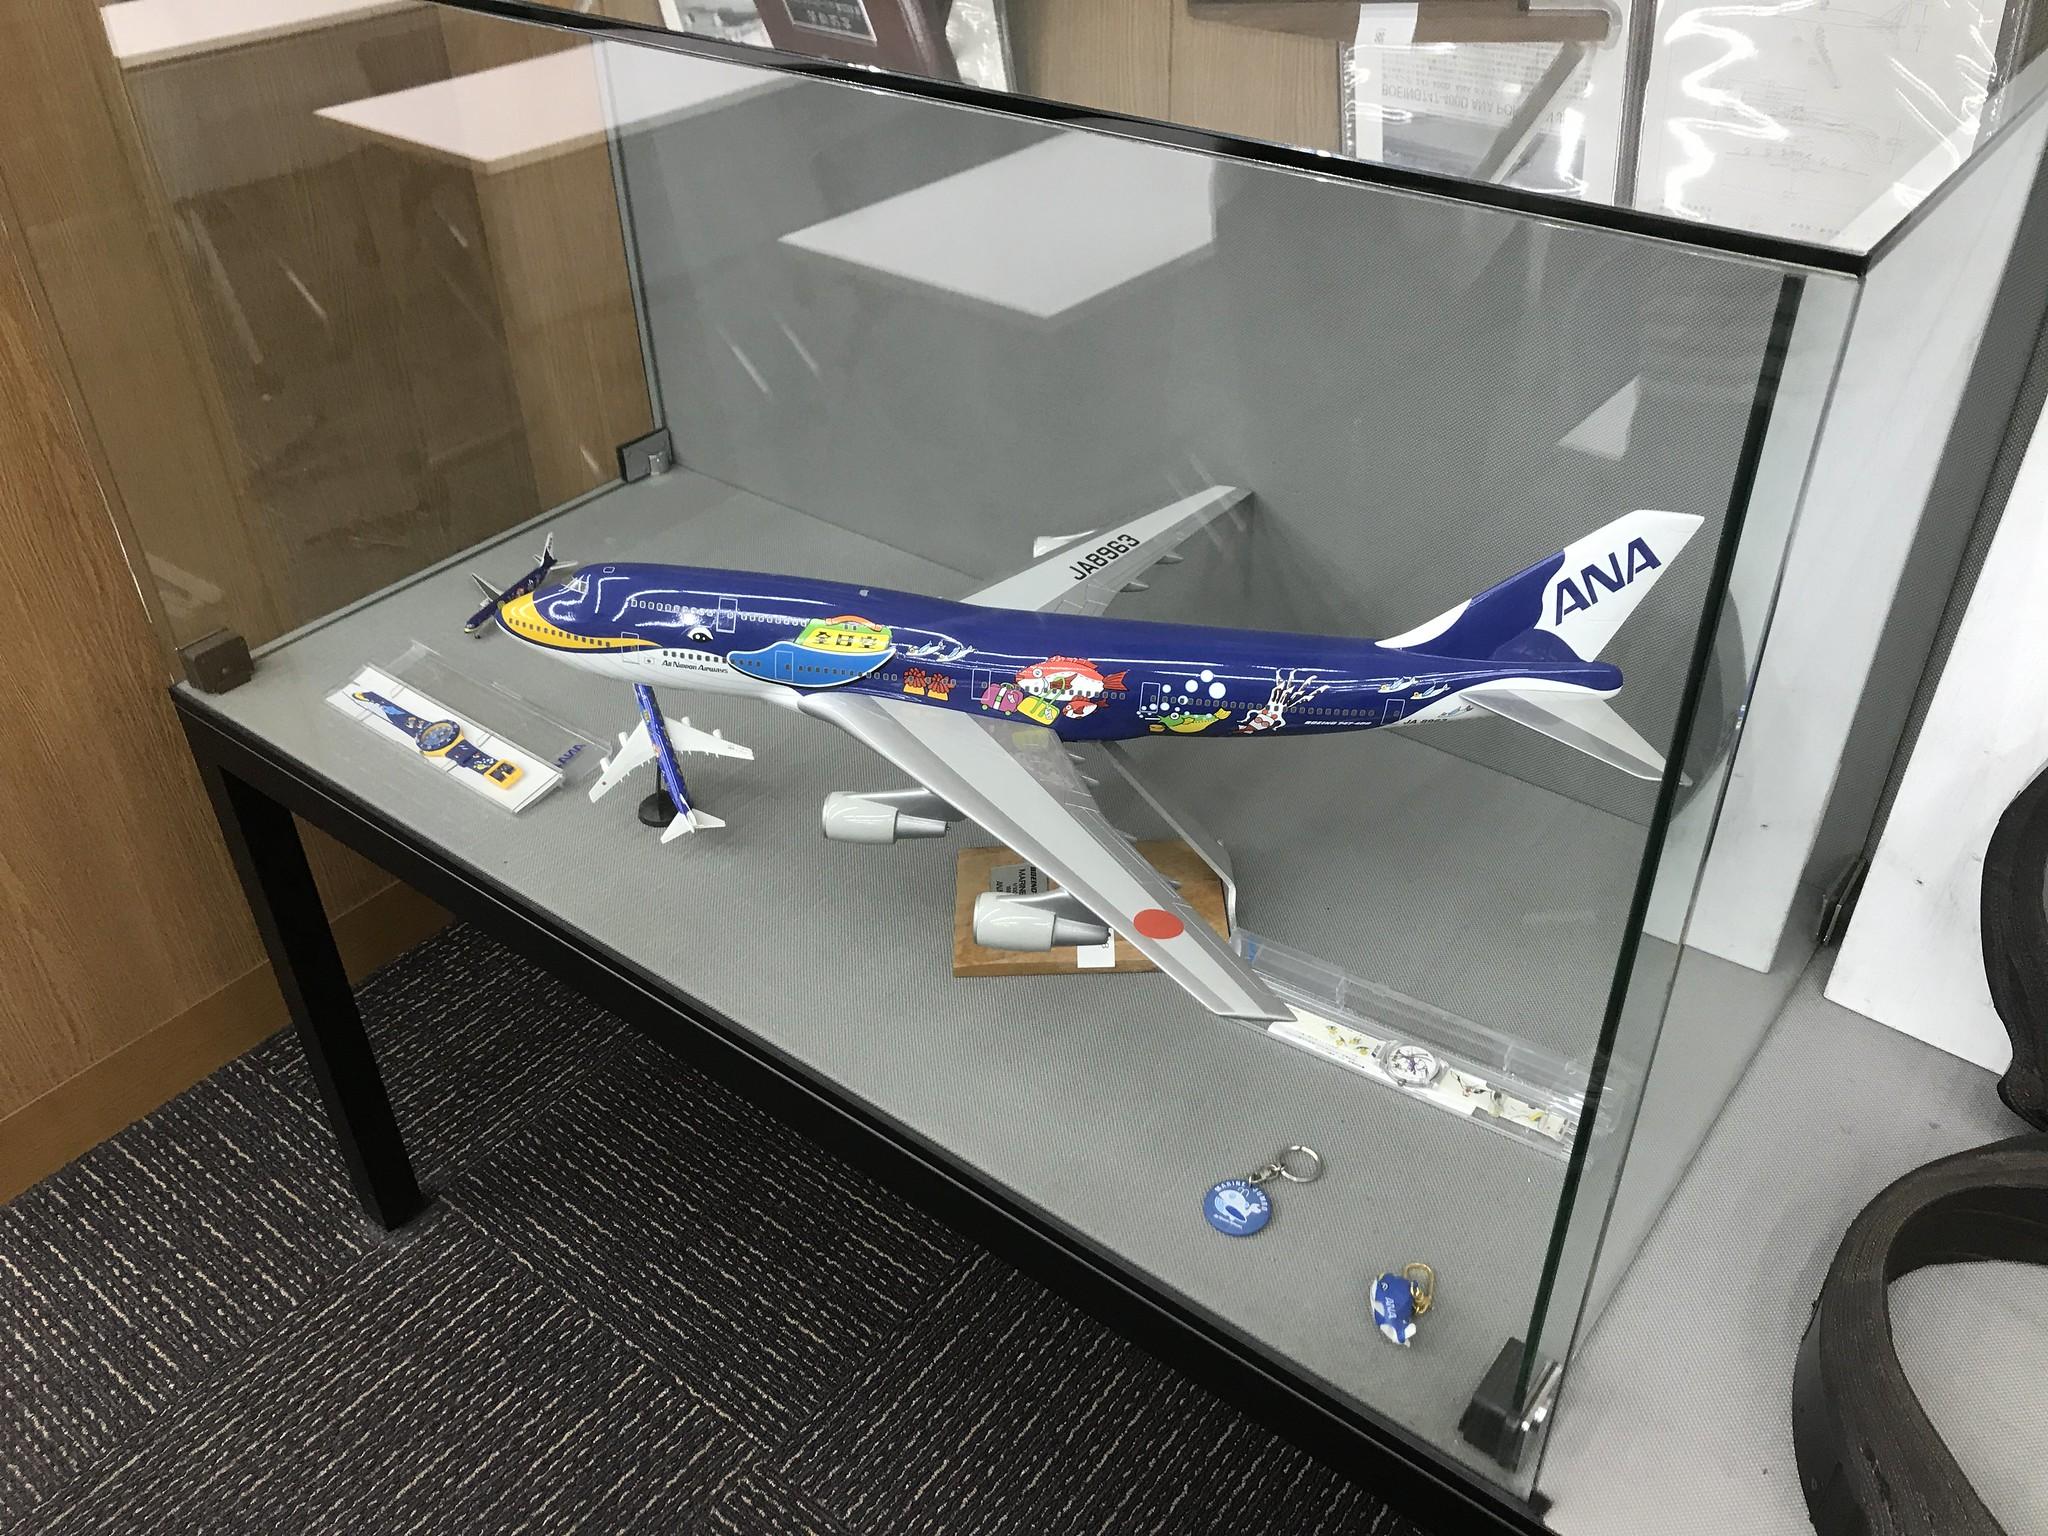 nipponico aeroplano sesso nudo ragazze com